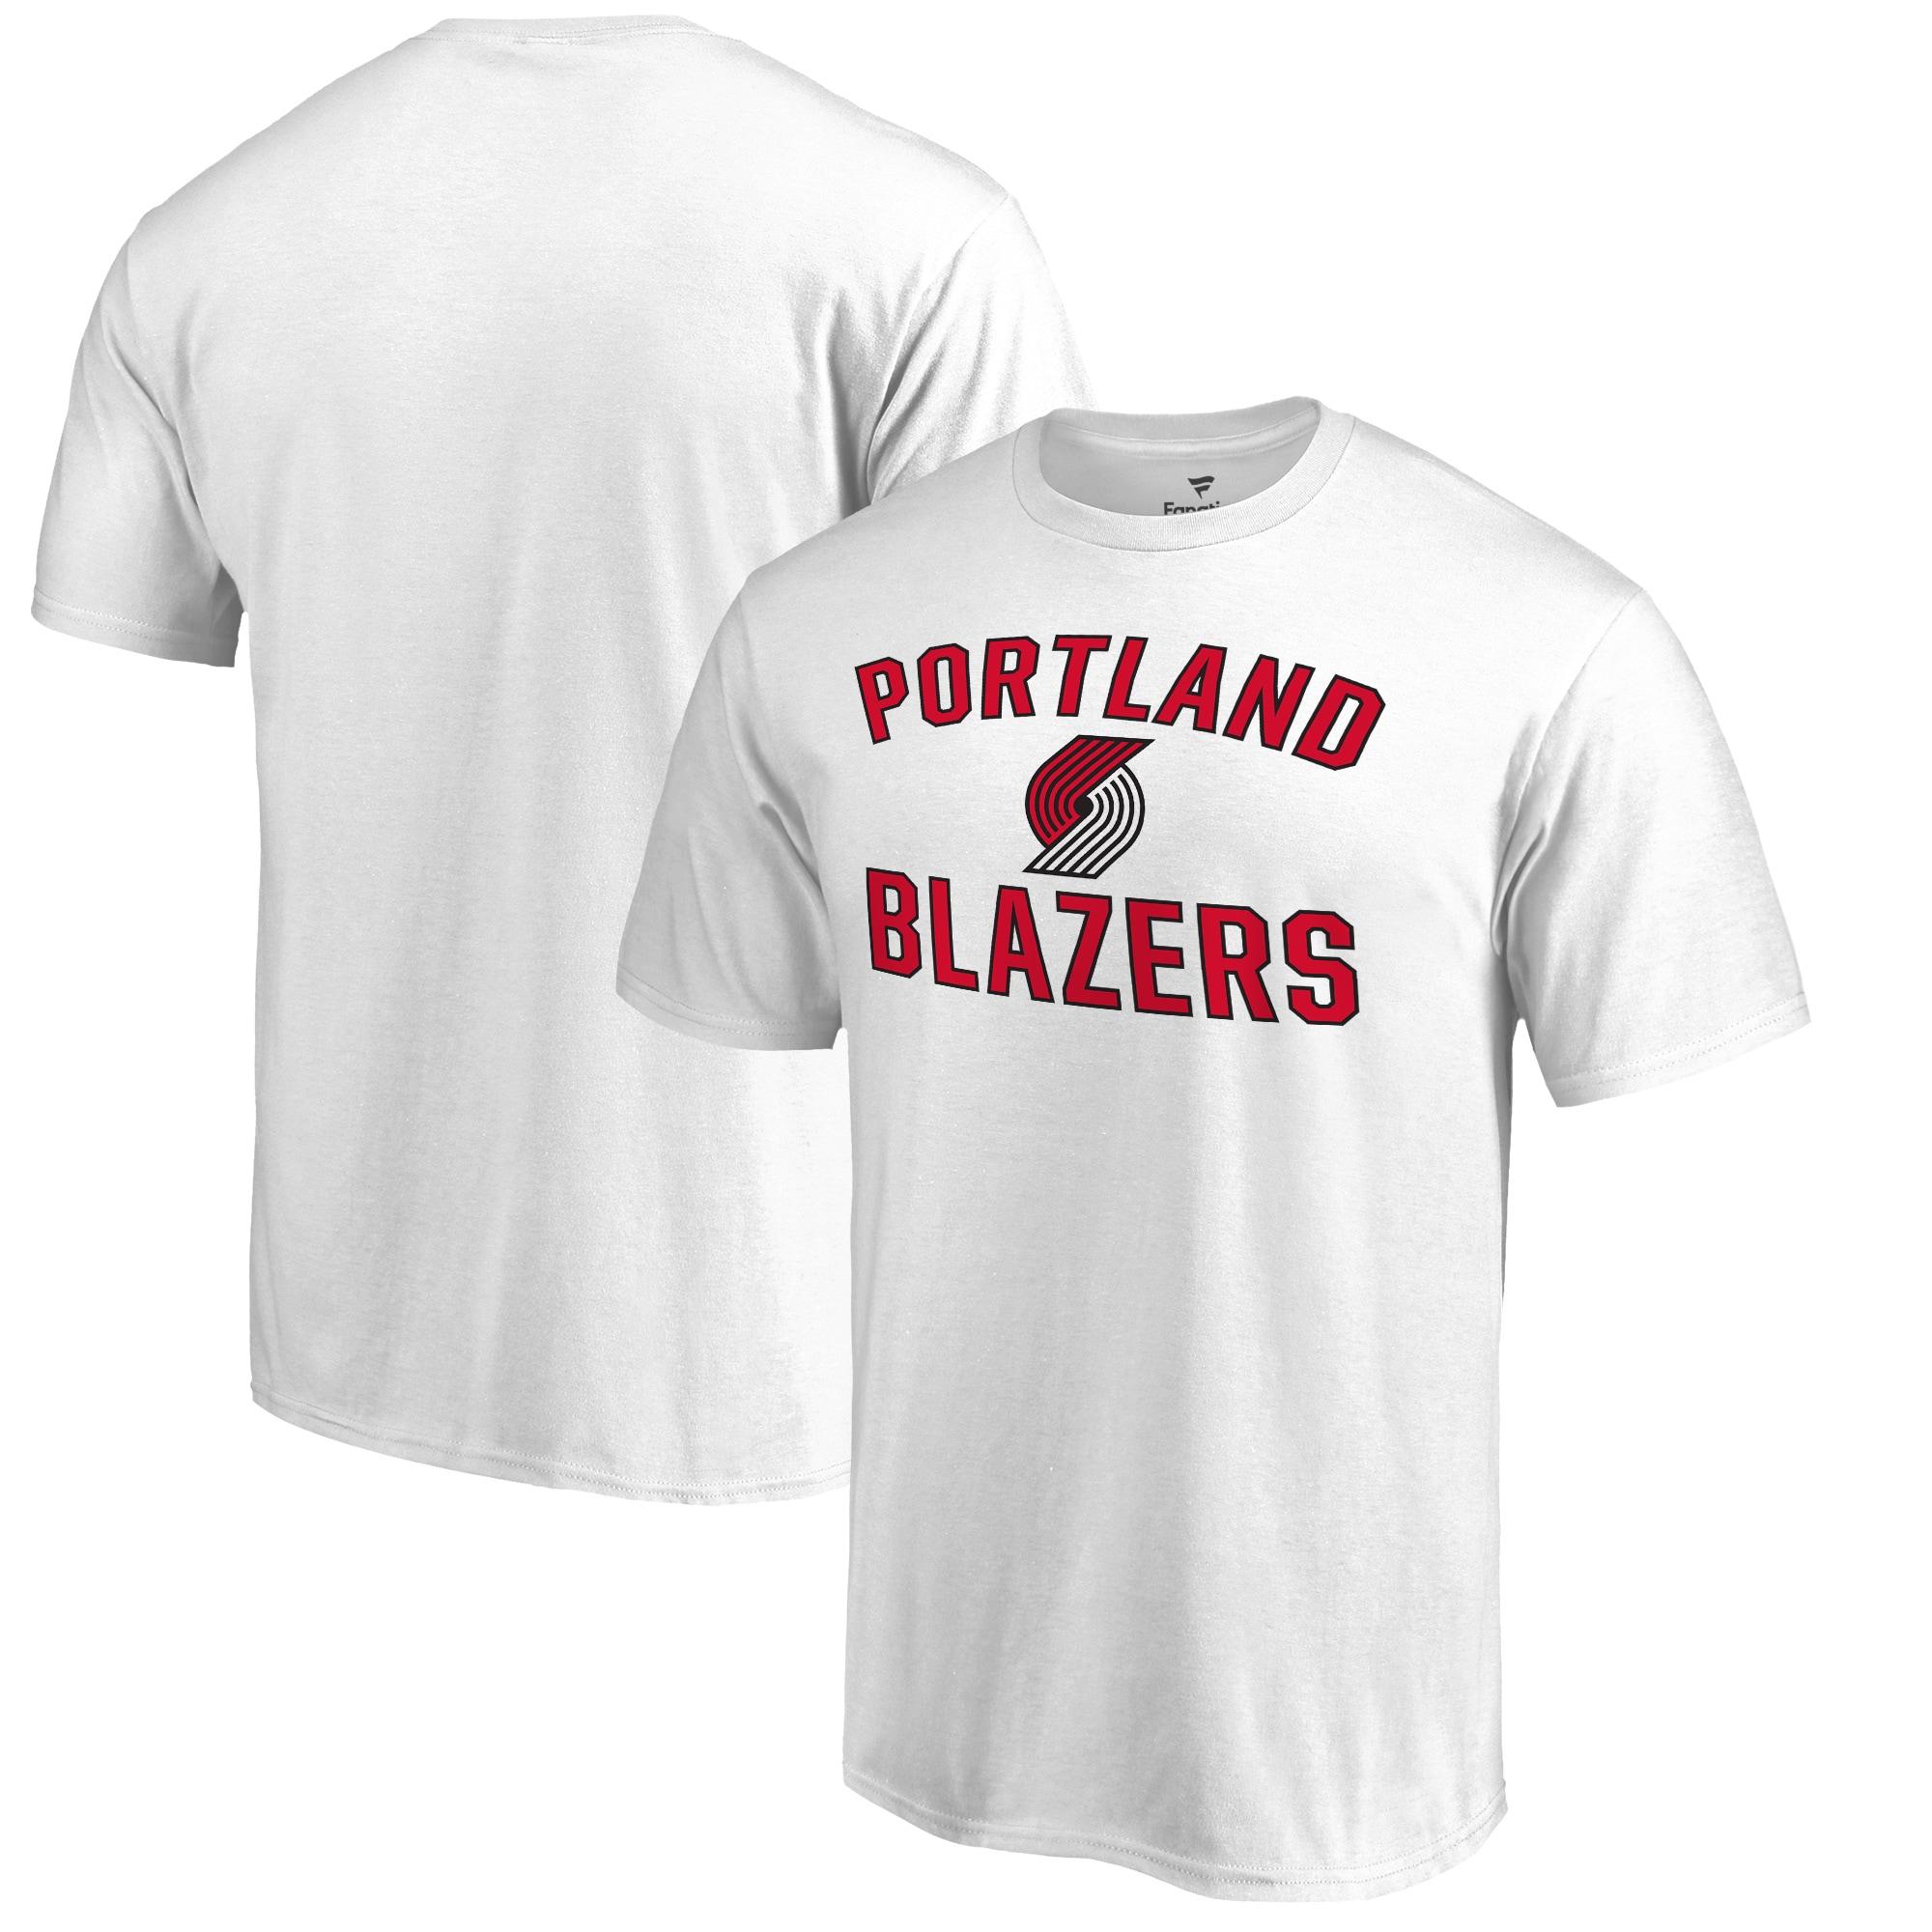 Portland Trail Blazers Victory Arch T-Shirt - White